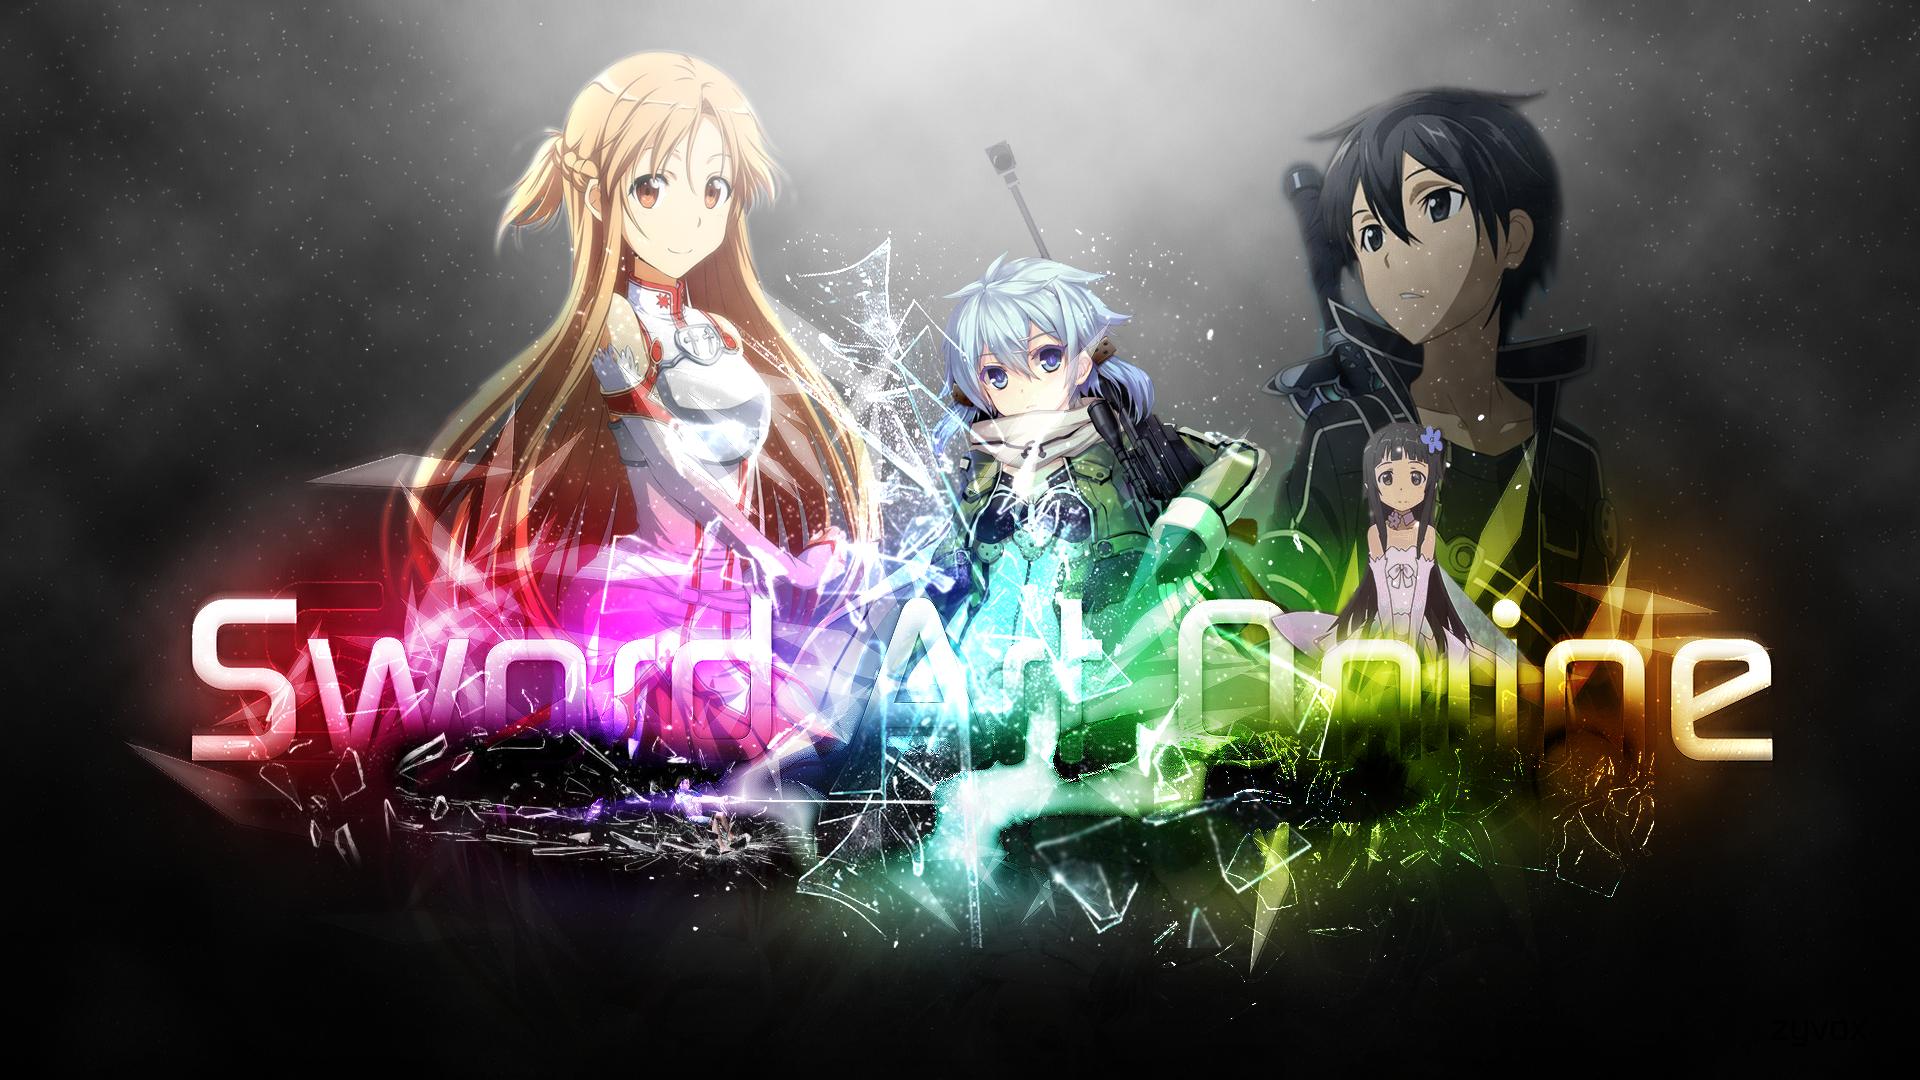 Sword Art Online Yui Anime Kirito Asuna Yuuki Sinon Fondo de Pantalla 1920x1080